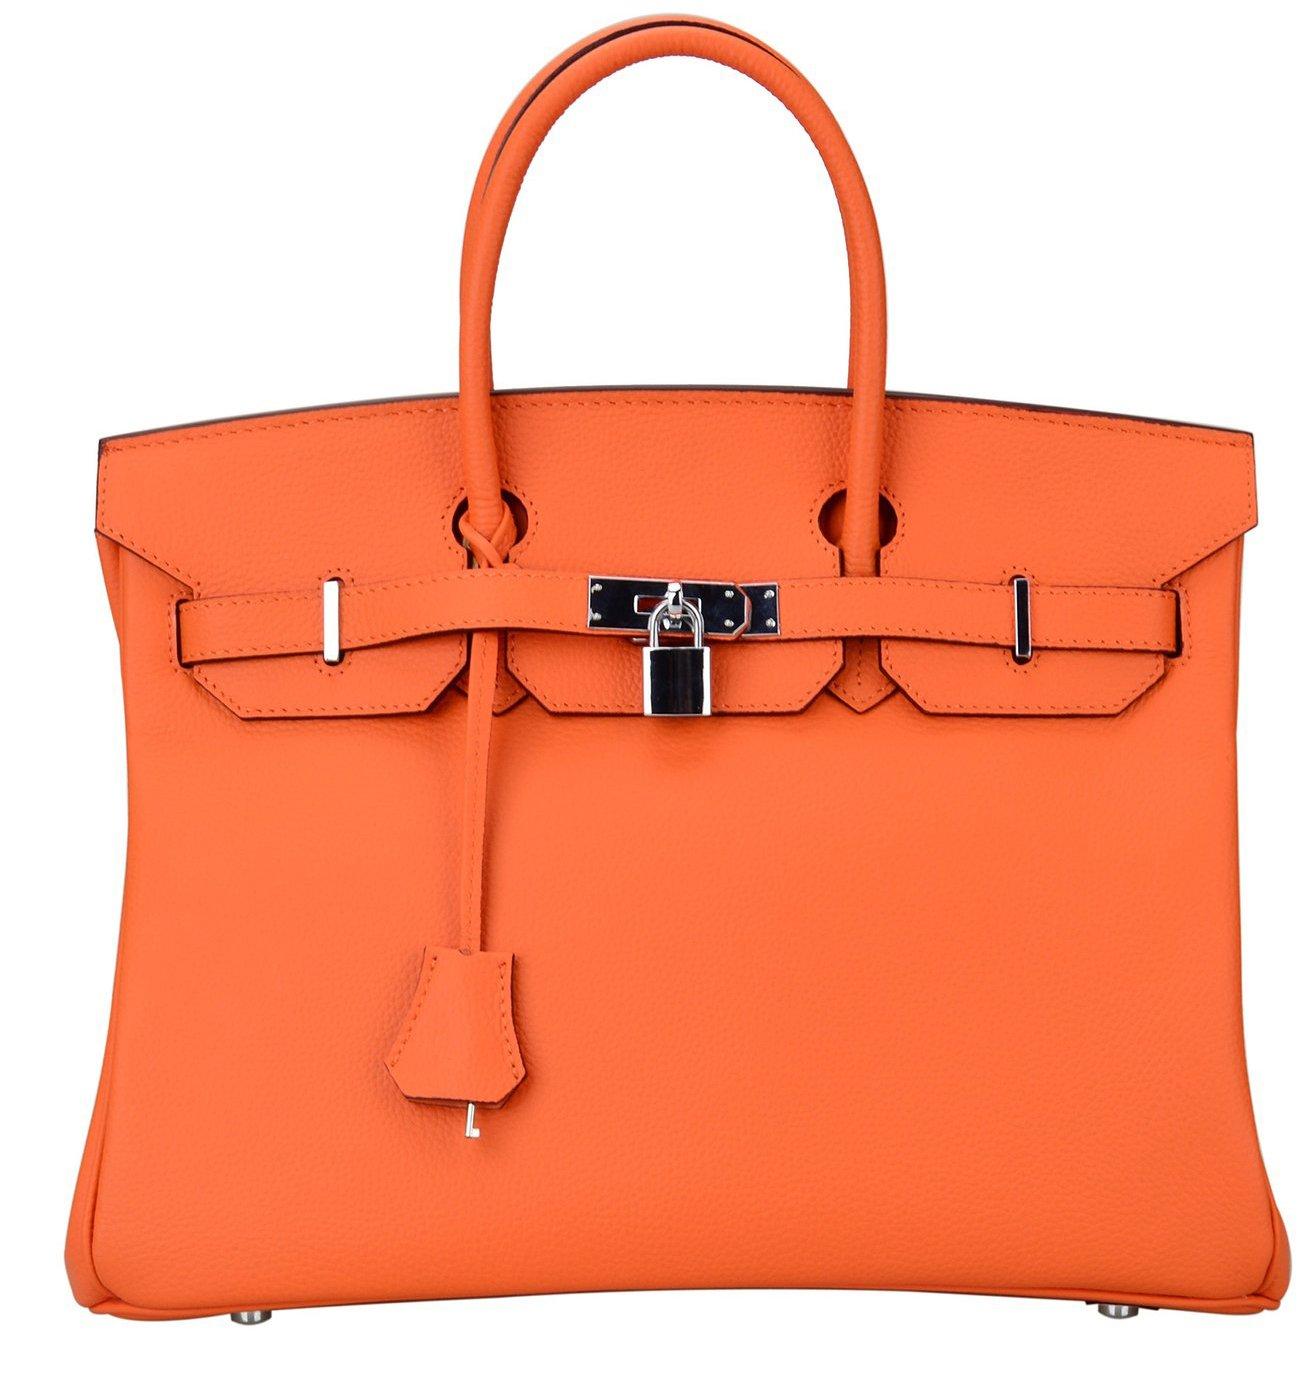 18df4a8922bc86 ... Top-Handle Bags · Ainifeel Women's Padlock Handbags with Silver  Hardware (35cm, Orange)